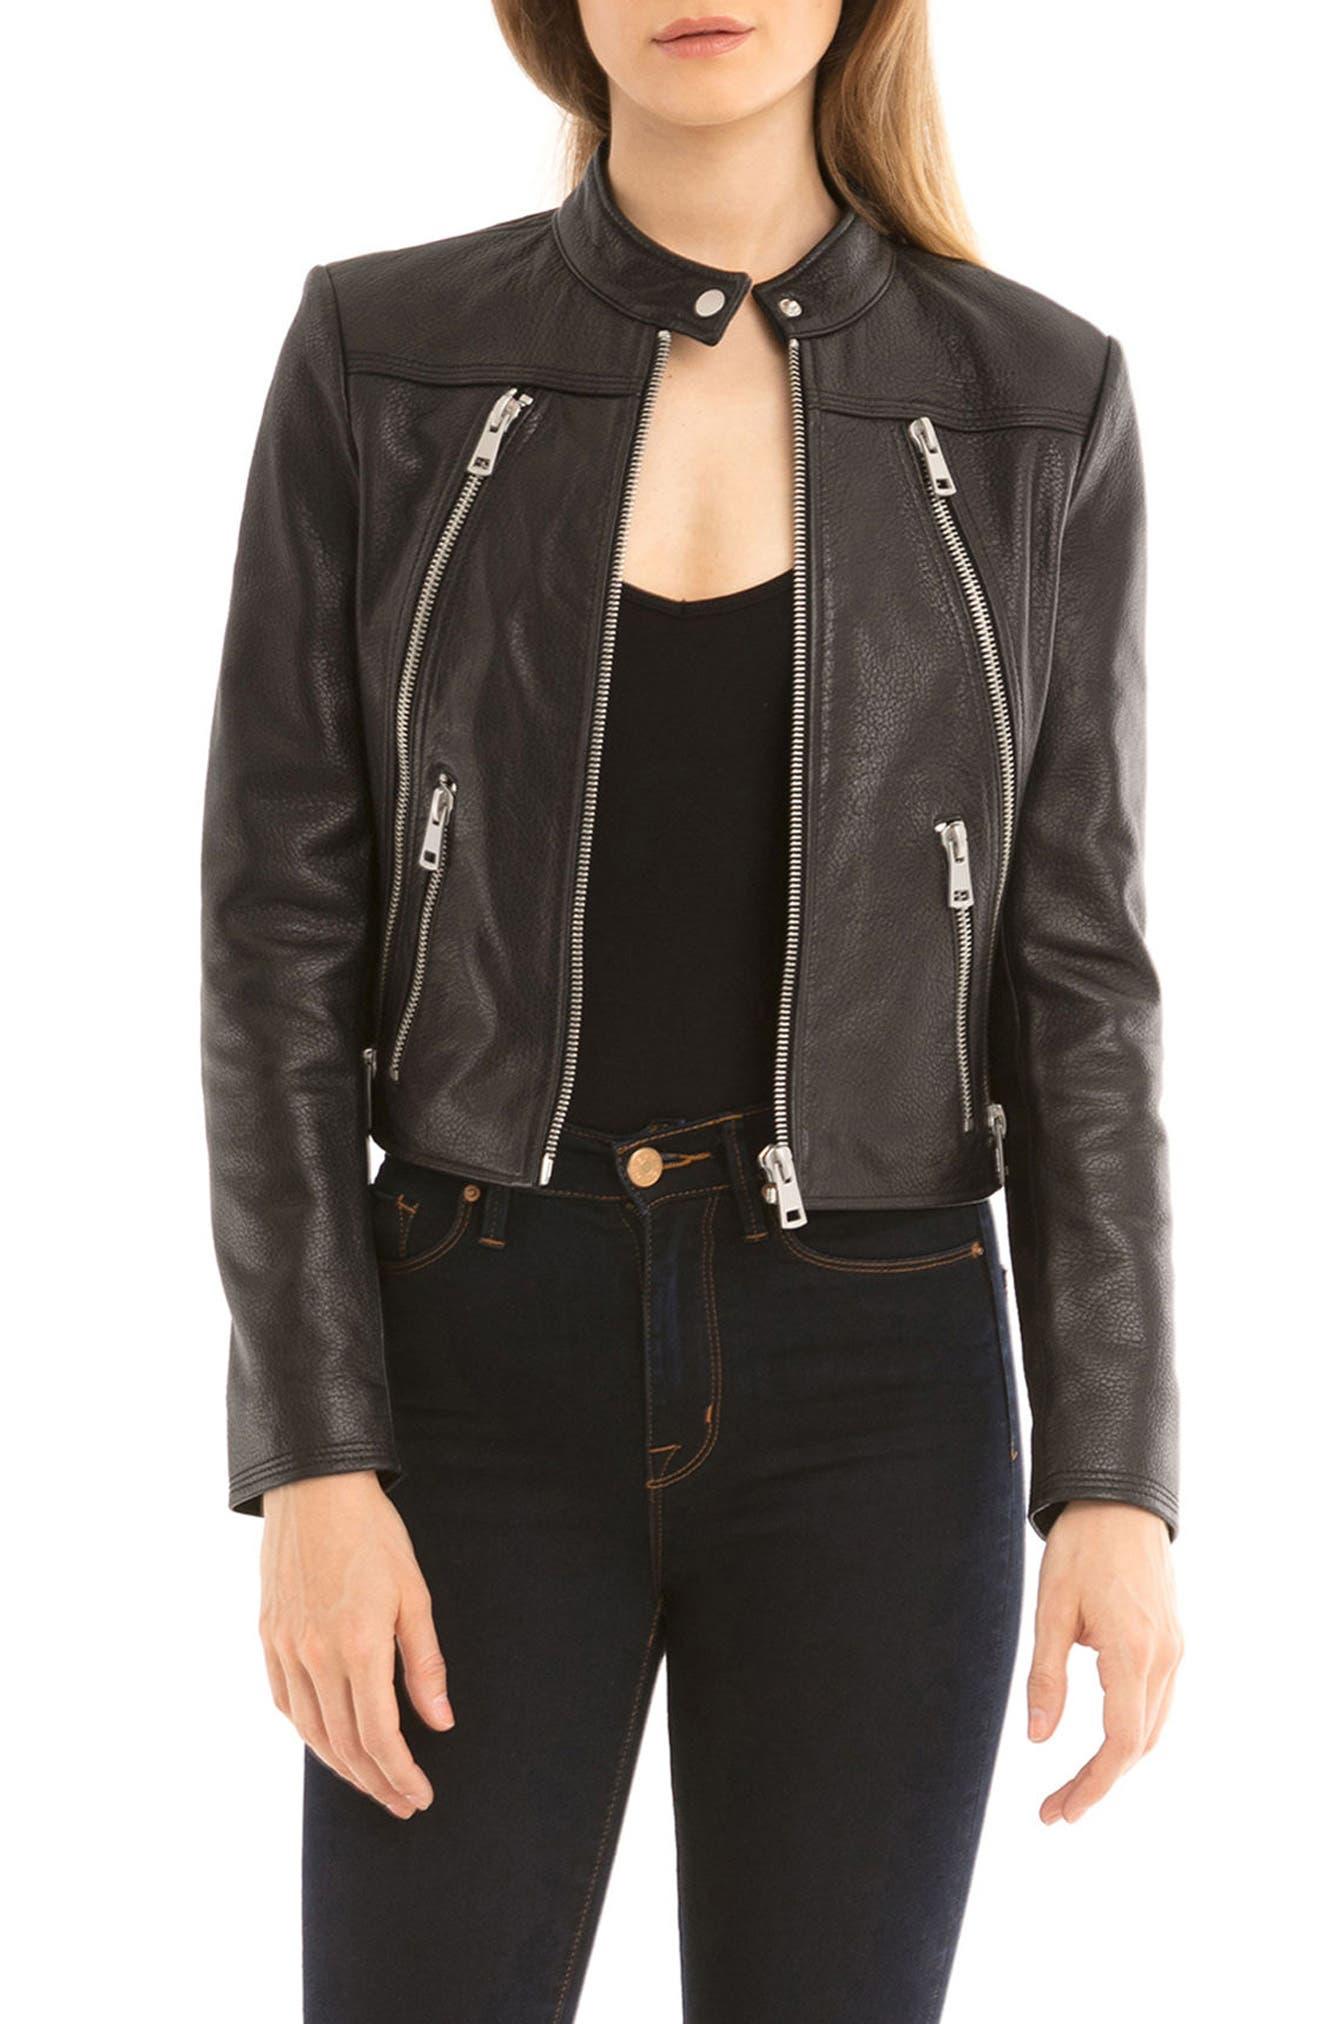 Bagatelle Textured Leather Jacket,                             Main thumbnail 1, color,                             001